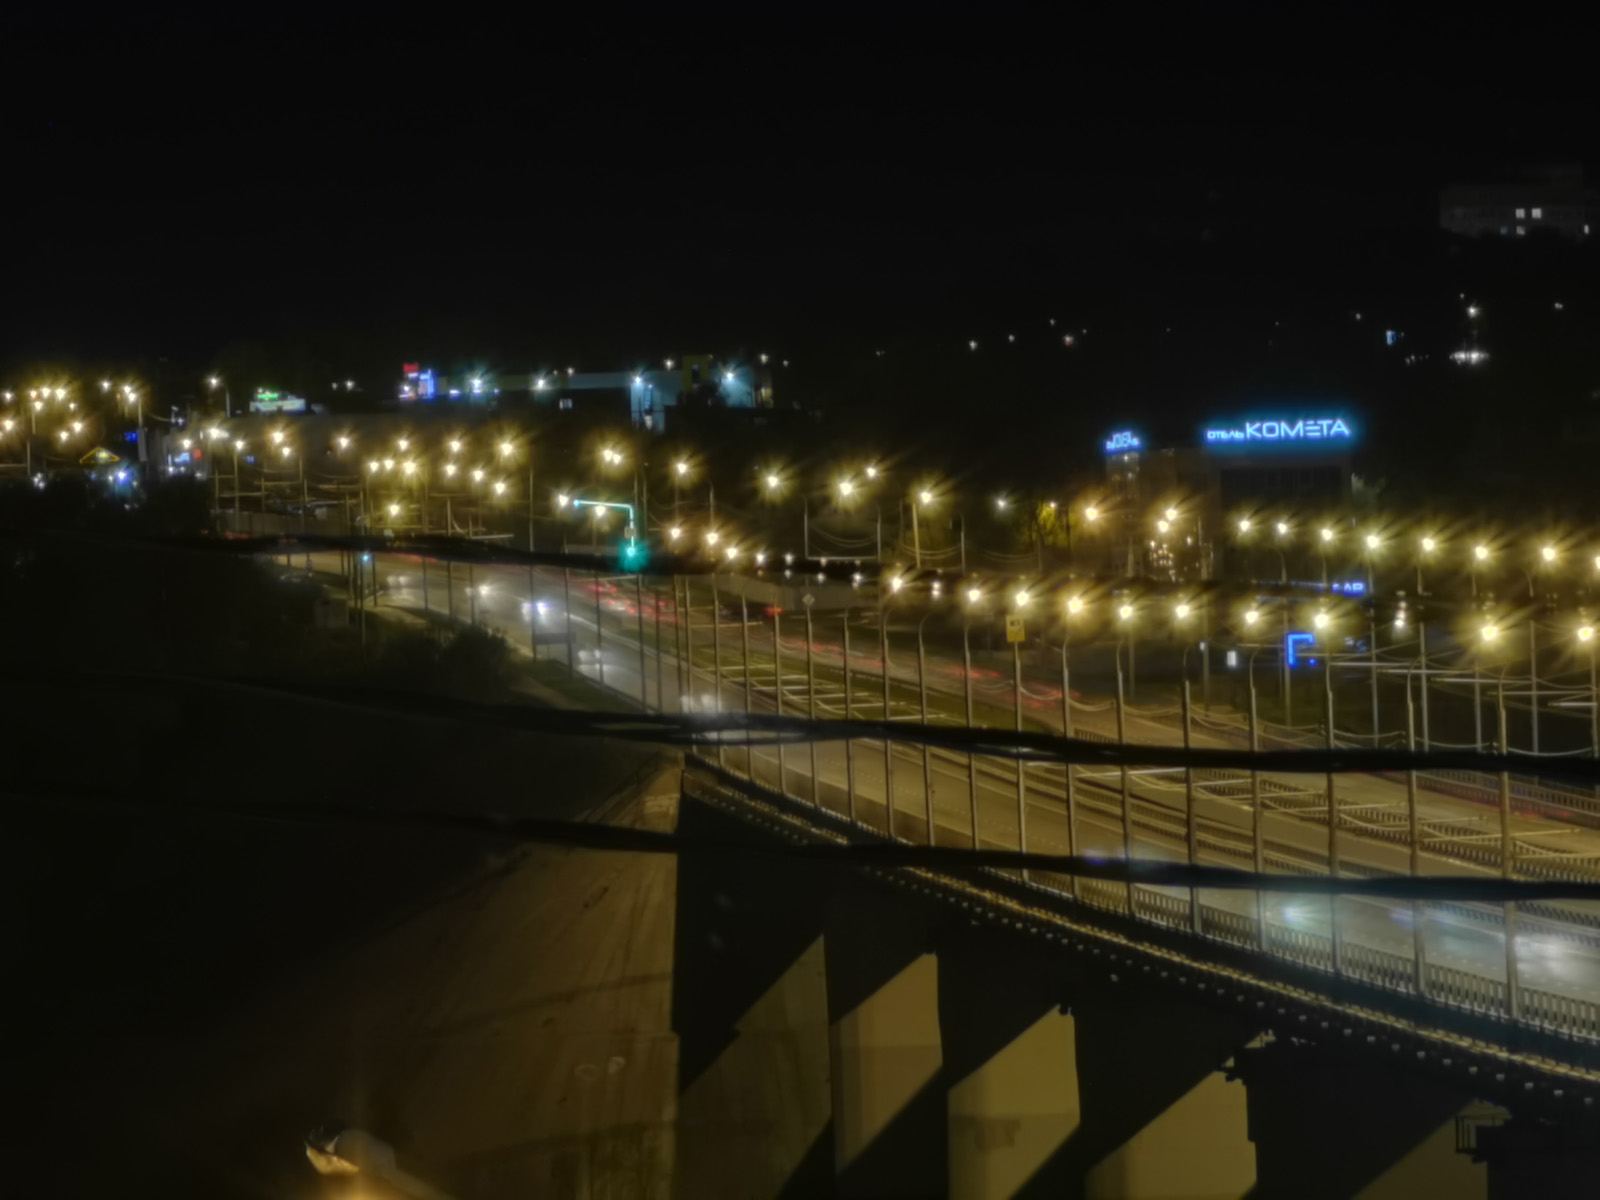 Ночной режим съёмки н Huawei P30 Pro 270 мм